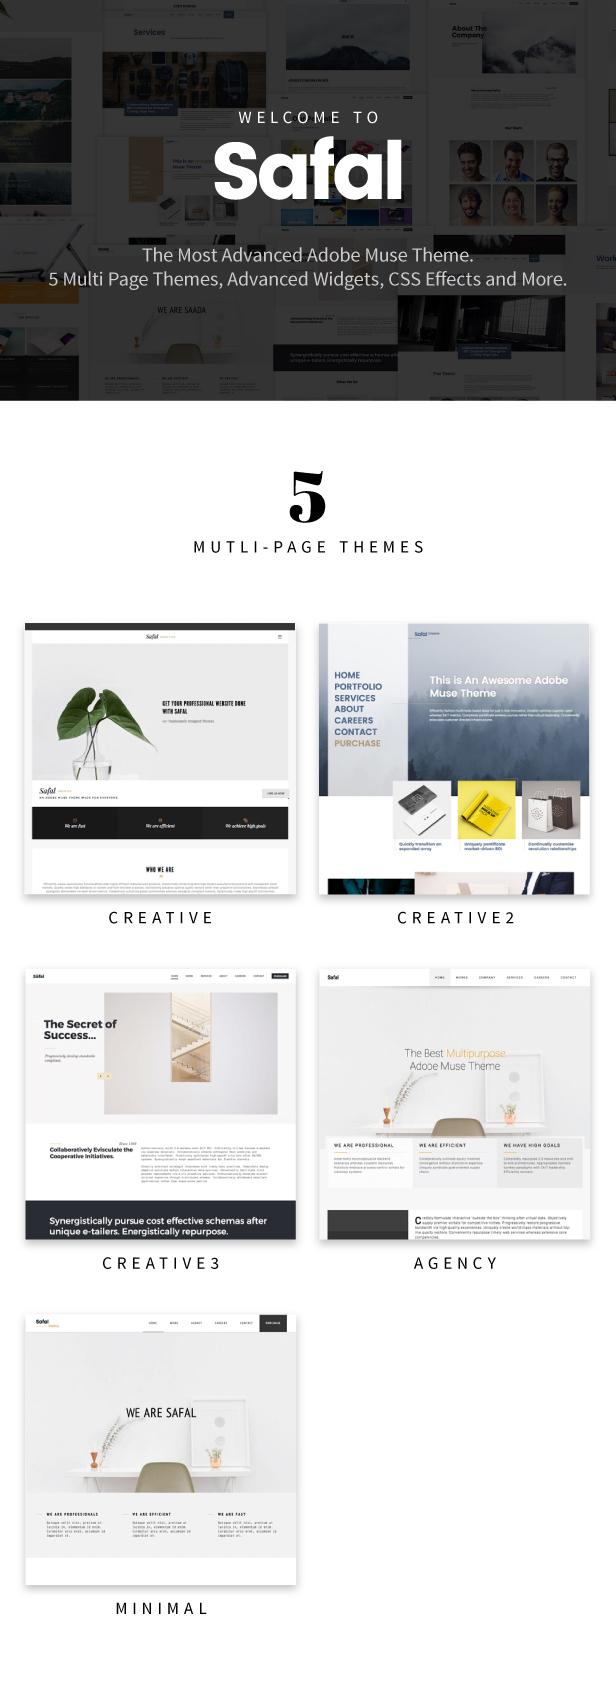 Safal: 5-in-1 Responsive Creative Multipurpose Adobe Muse Theme - 1